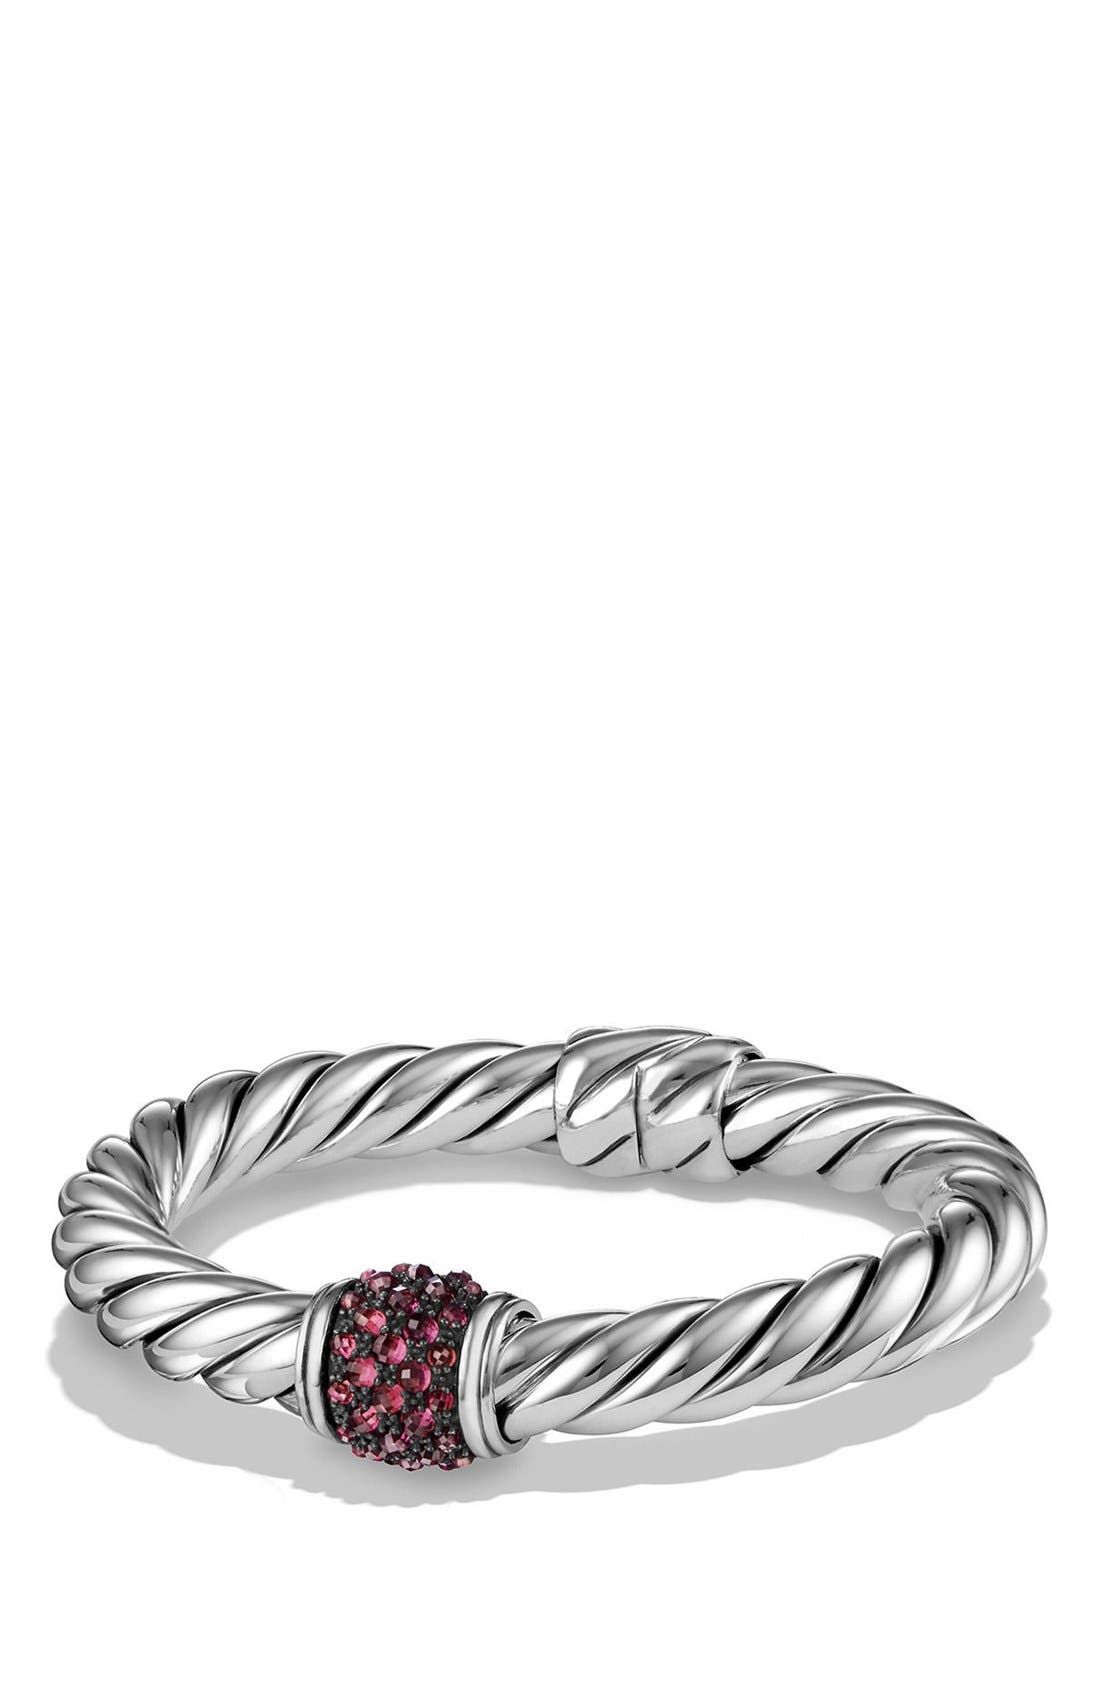 Cable Berries Hinge Bracelet,                             Main thumbnail 1, color,                             SILVER